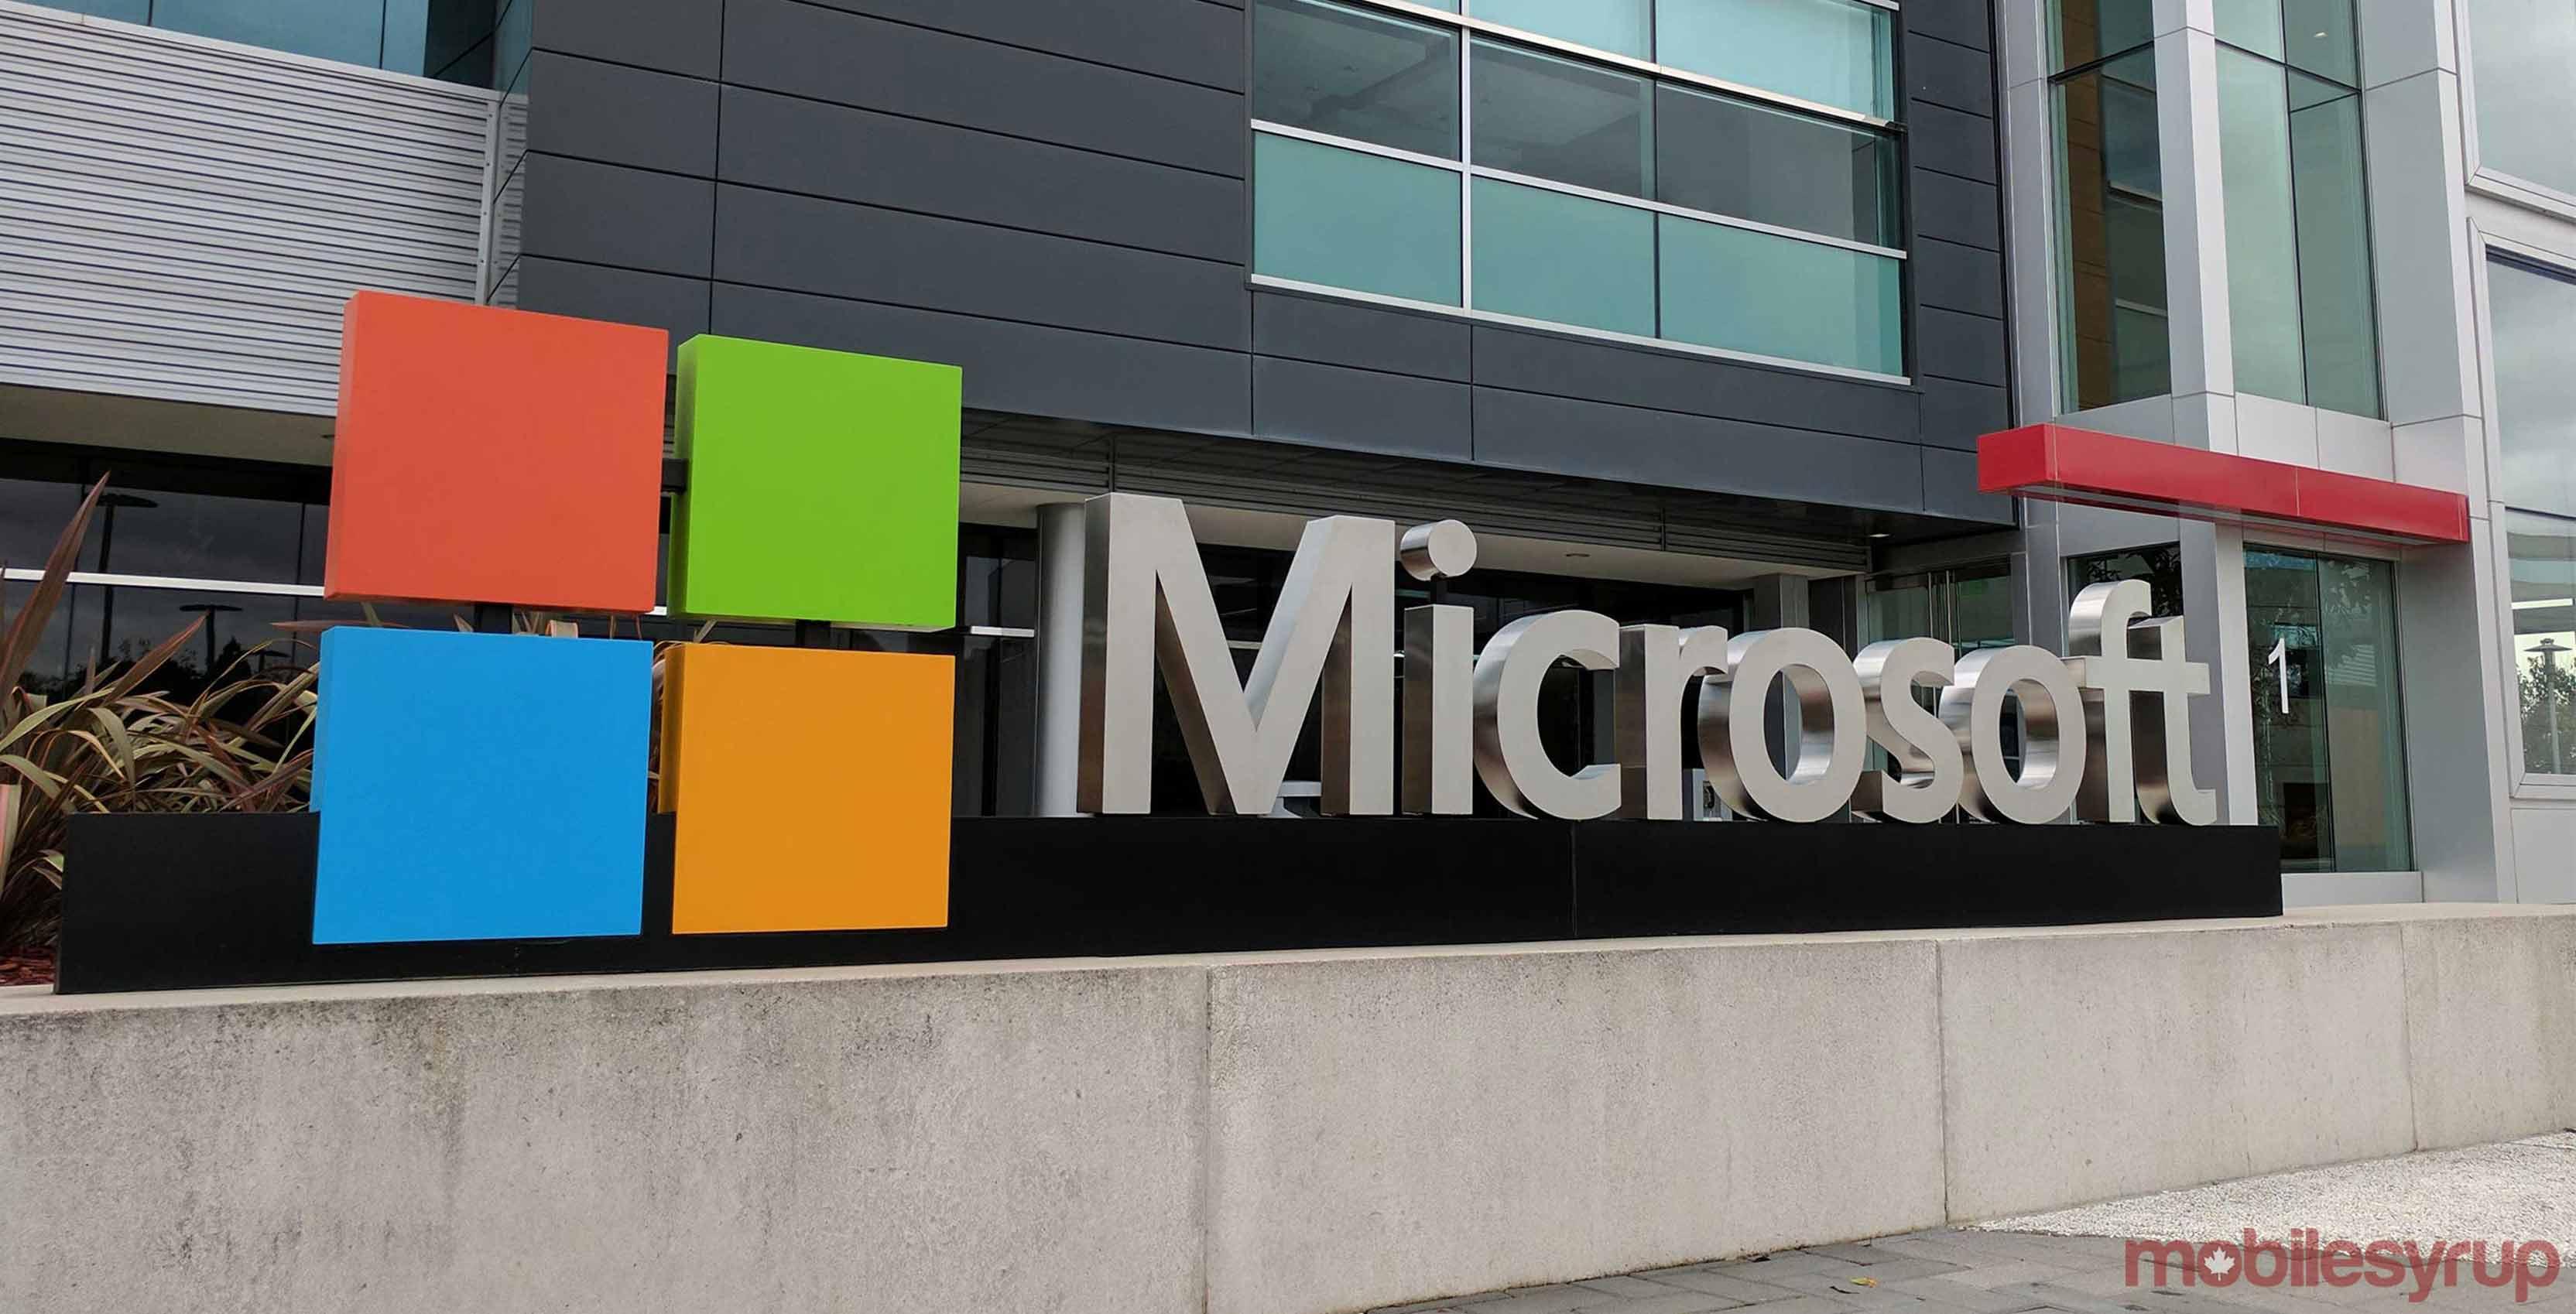 Microsoft logo on building - Microsoft service outage